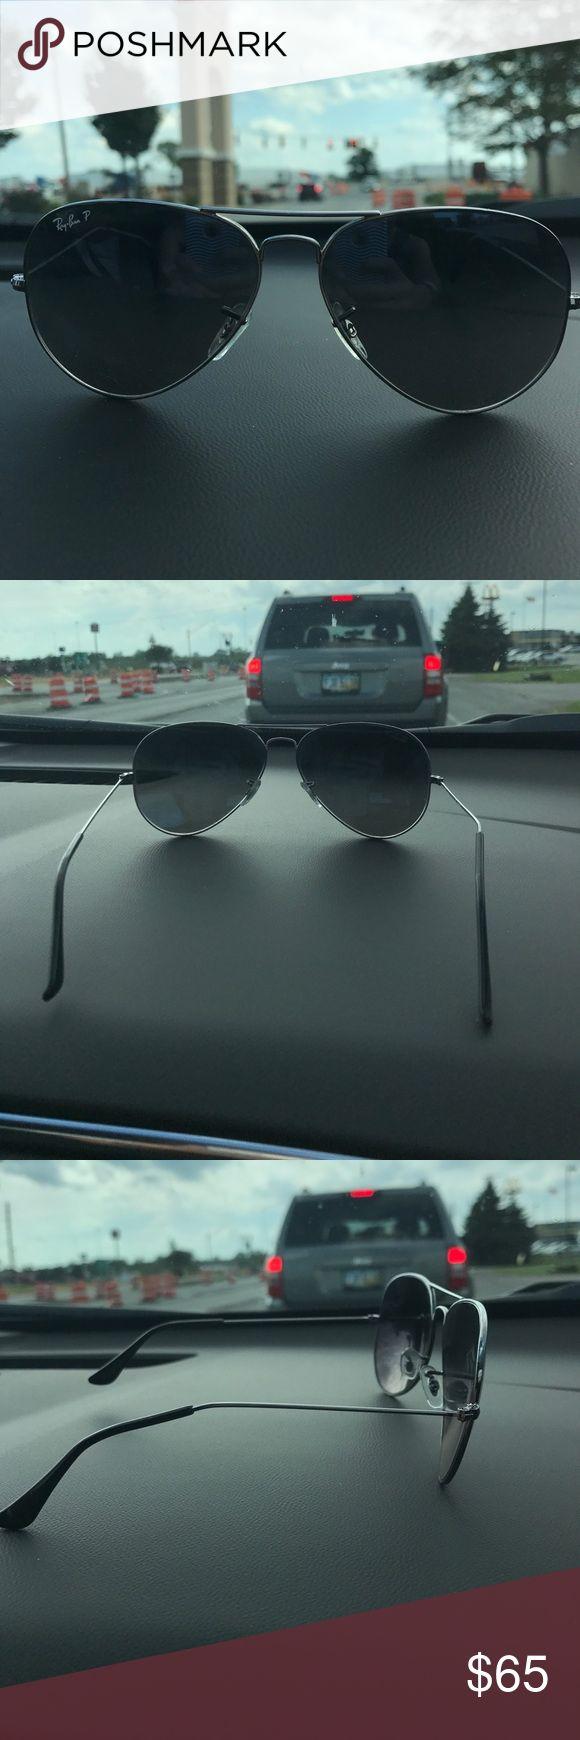 Ray-Ban Men's Ray-Bans aviator sunglasses. Polarized Ray-Ban Other